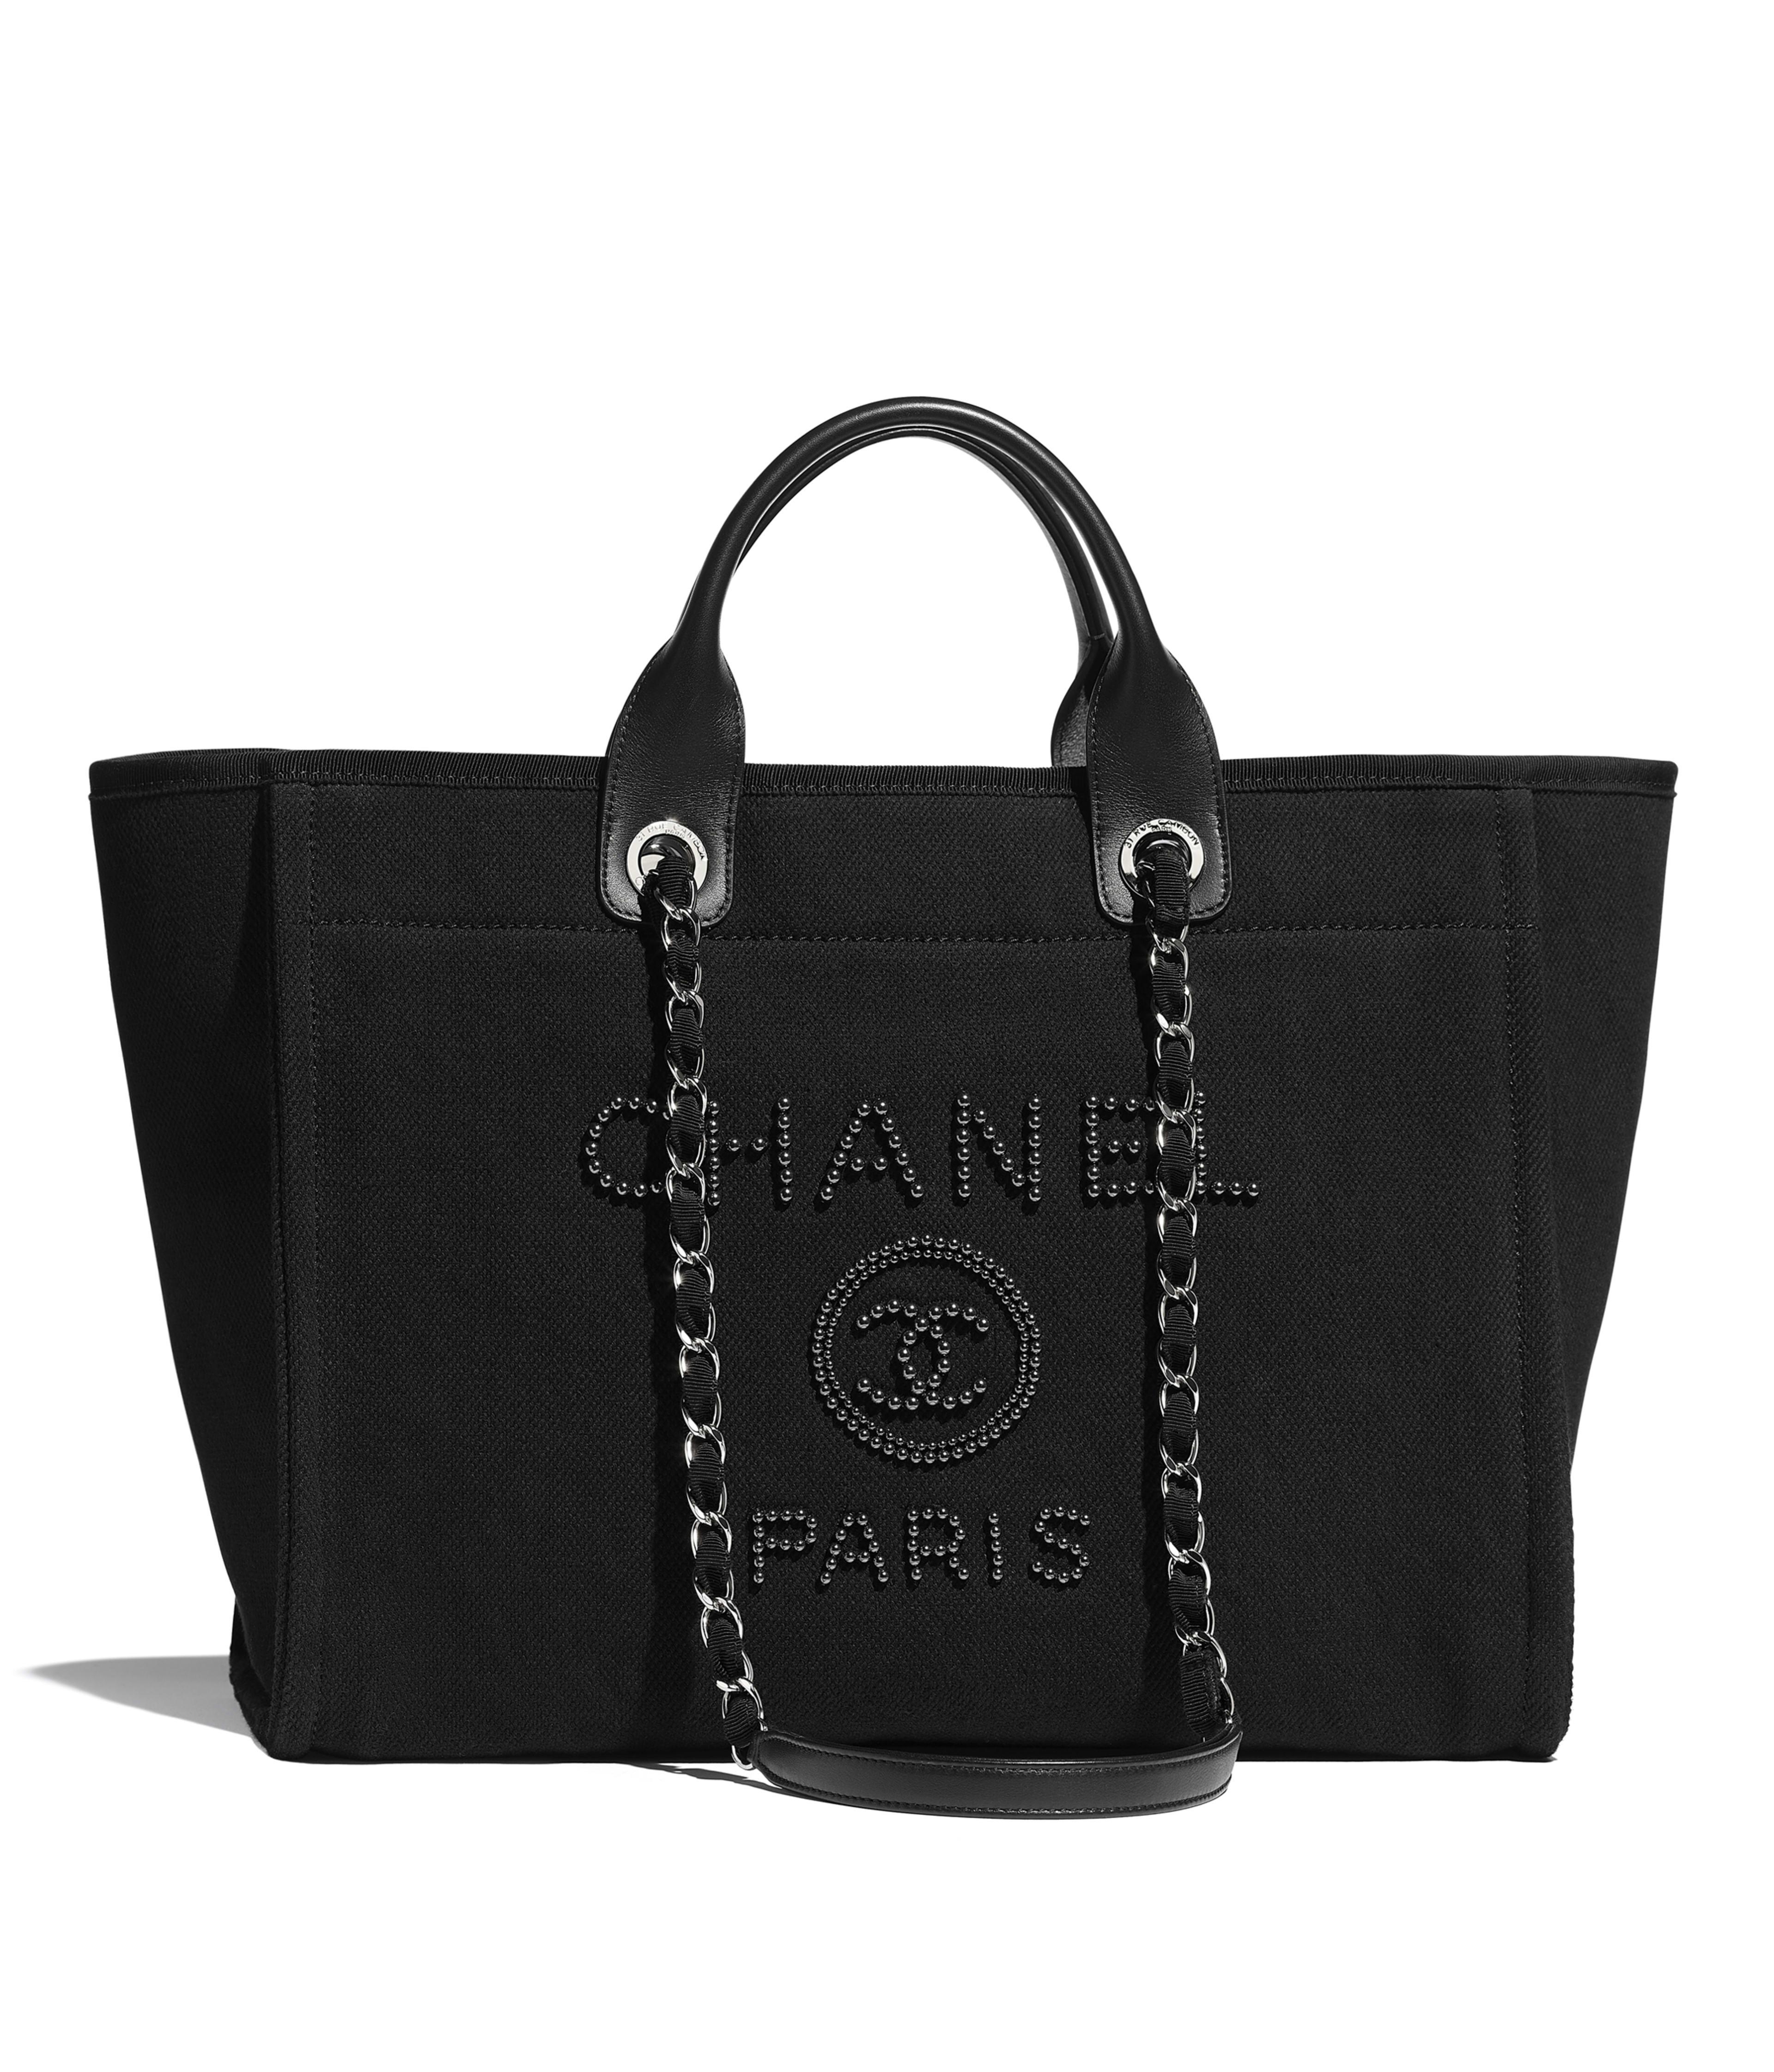 Ping Bags Handbags Chanel